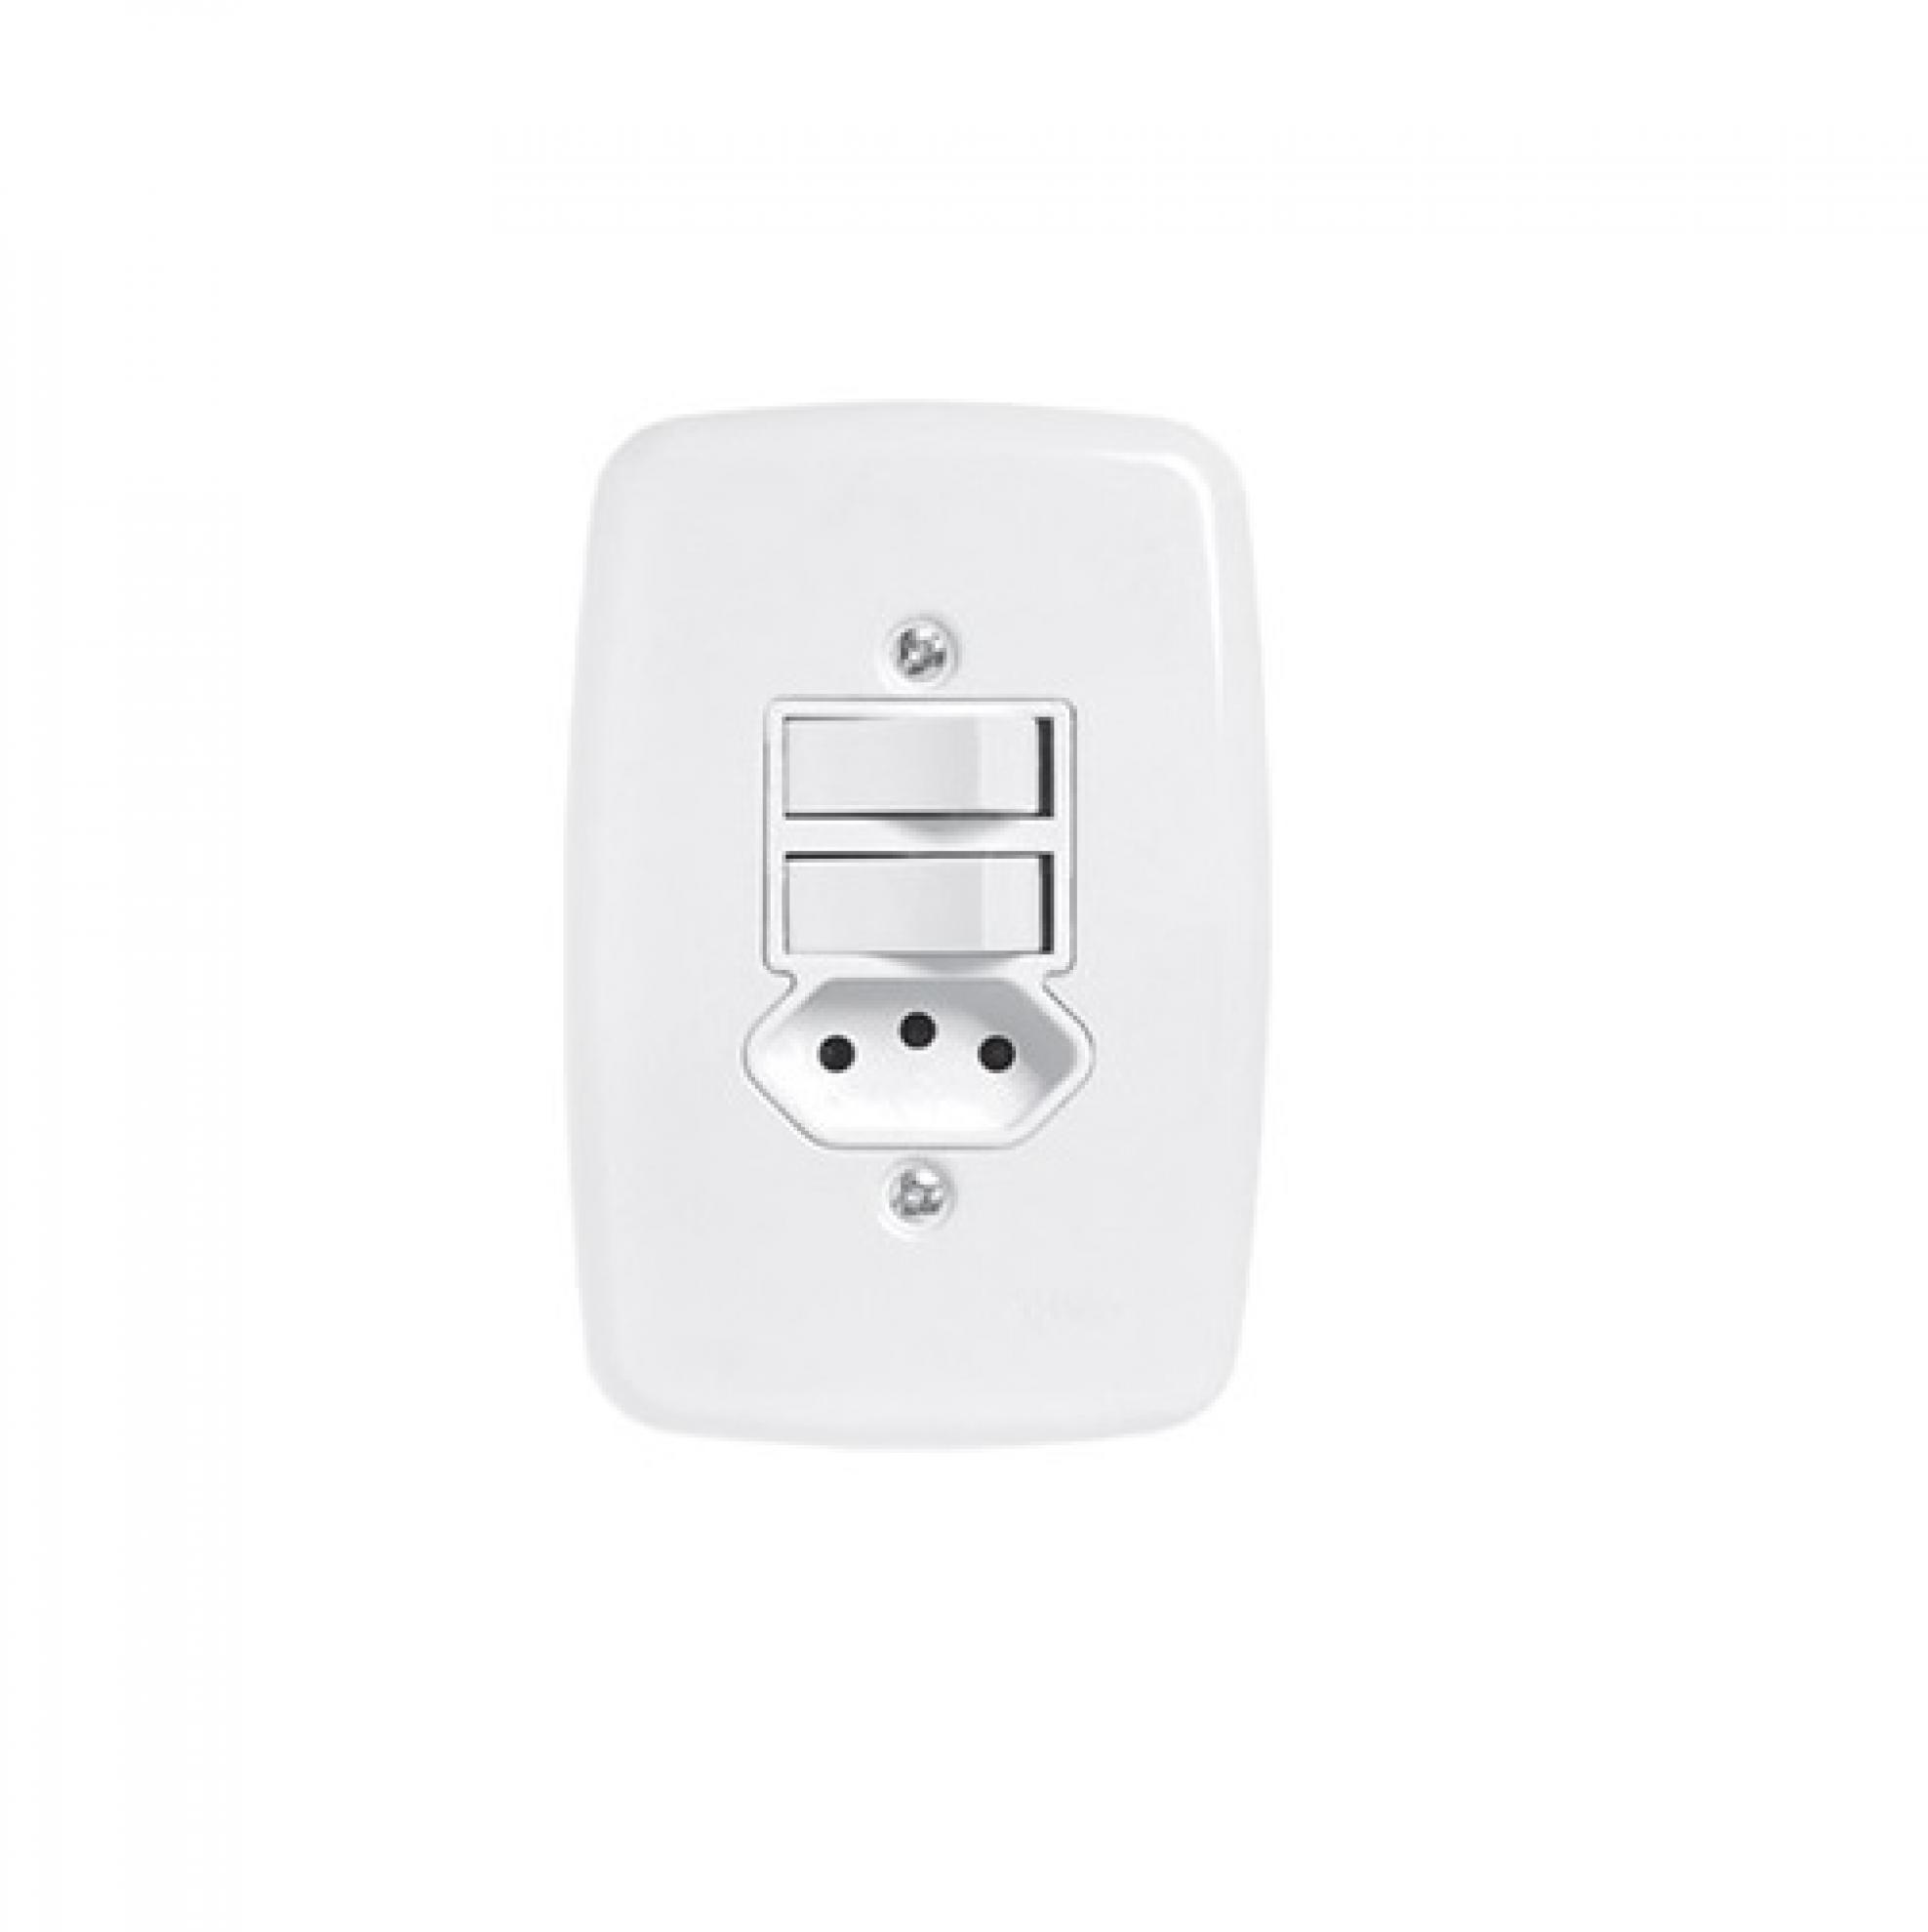 Interruptor de 2 tecla com tomada 4x2- Simples